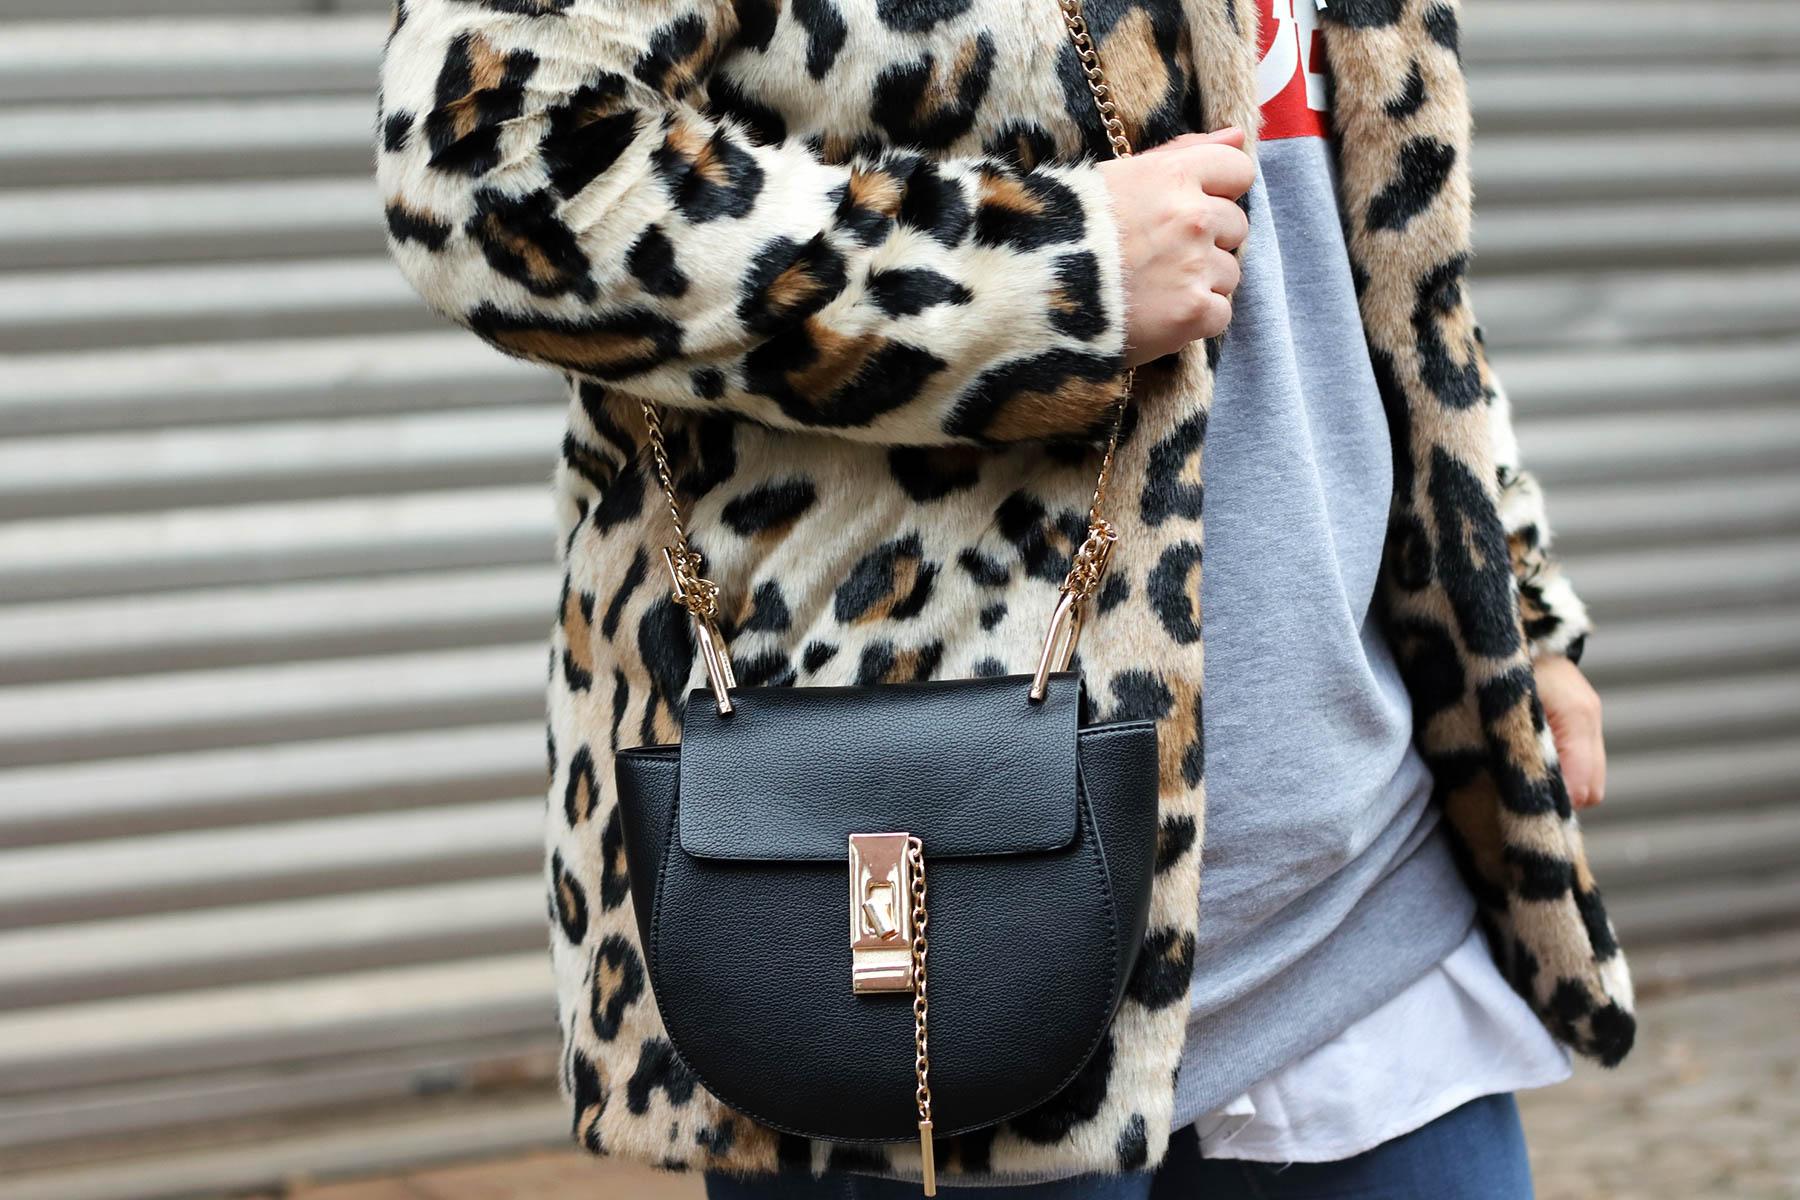 outfit-modeblog-fashionblog-fashionpassionlove-leo-mantel-trend-mantel-winter-sneaker-adidas12 (1 von 1)